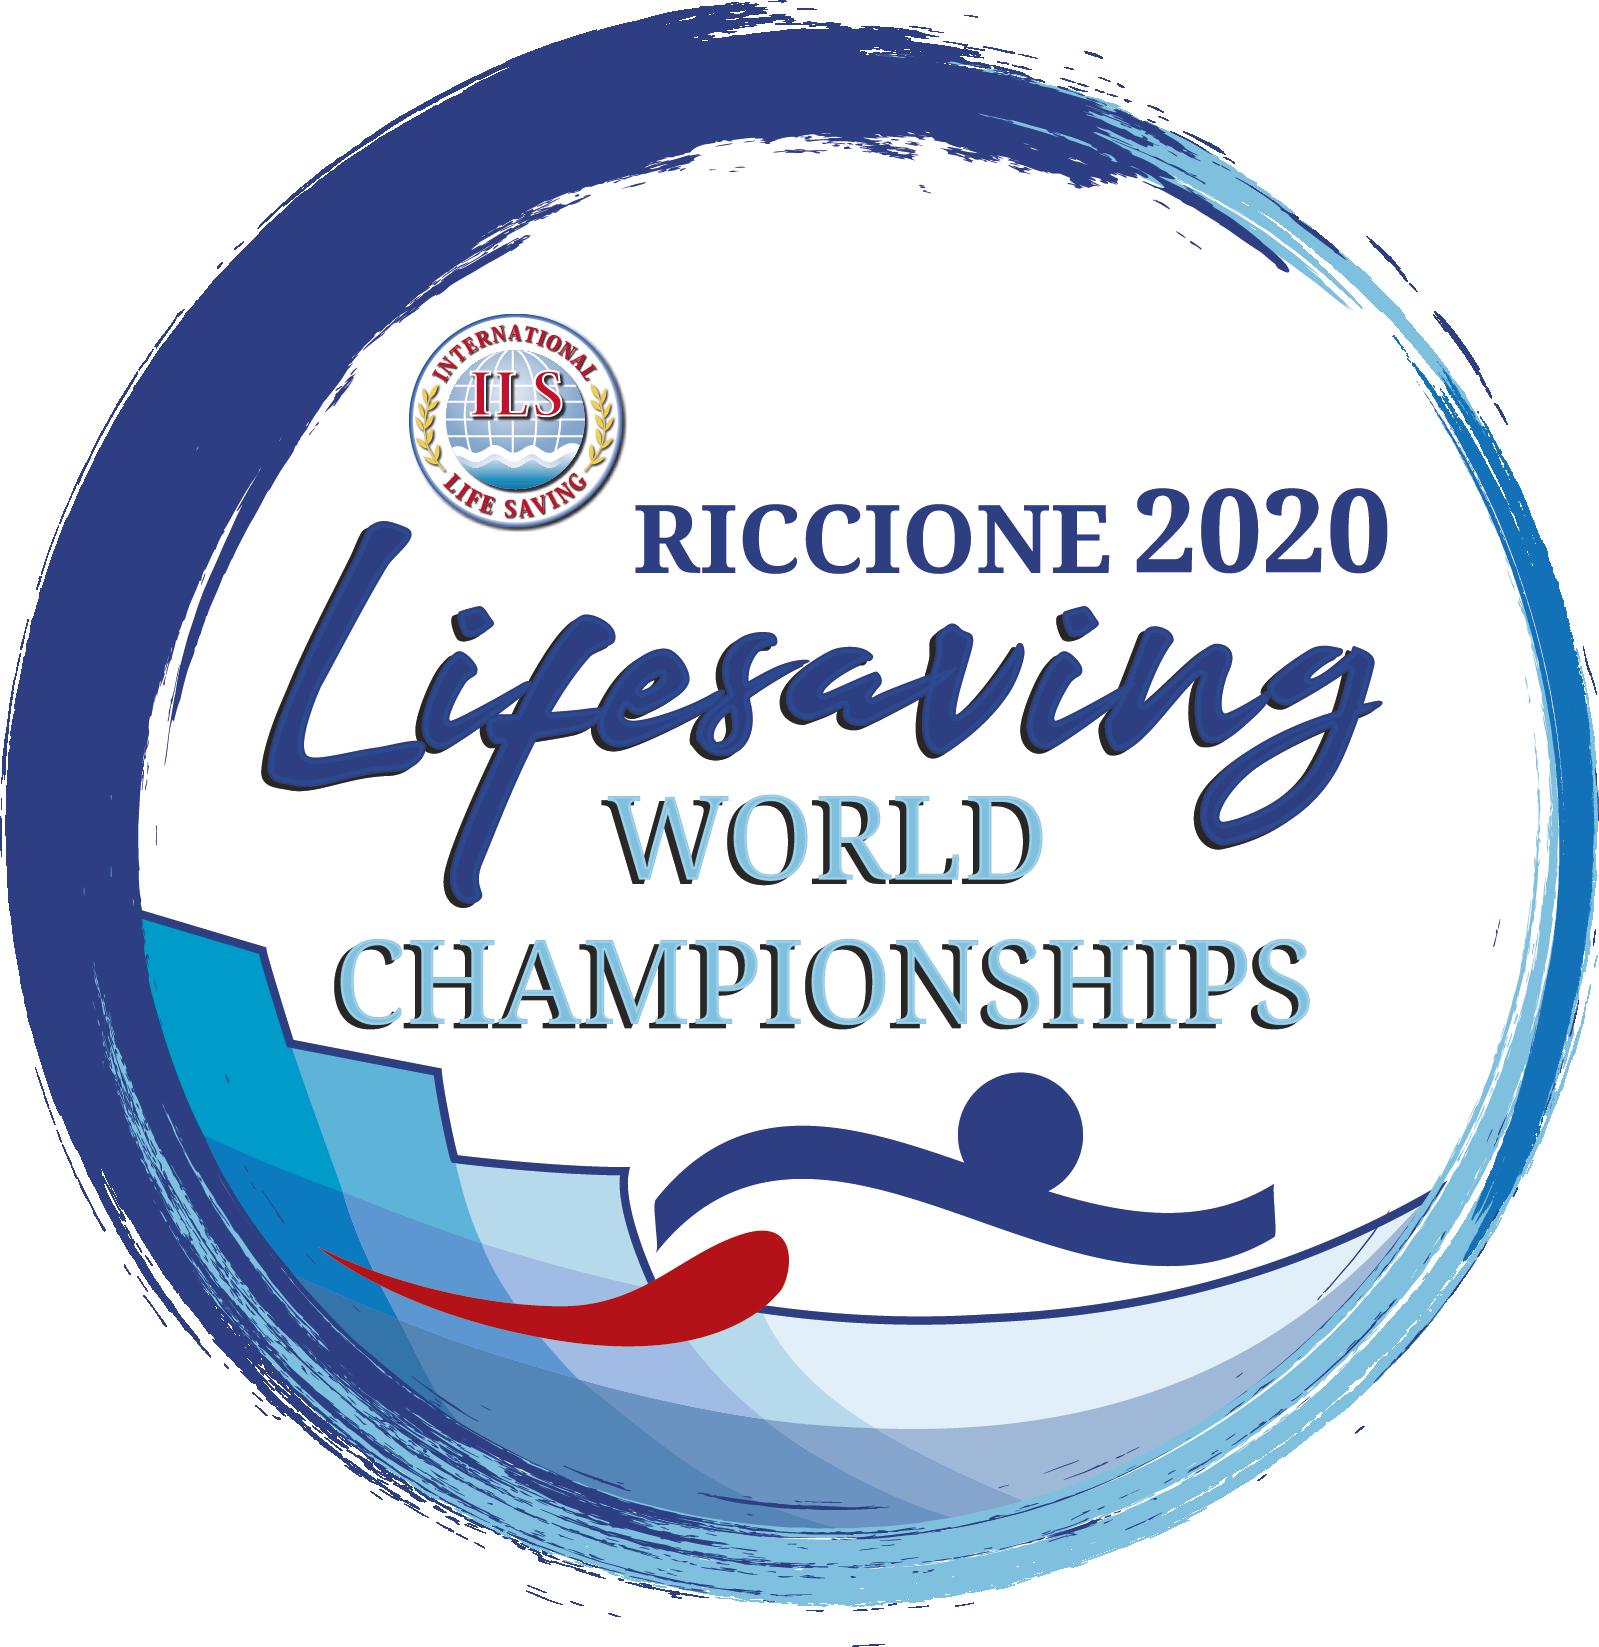 Champions 2020 Calendario.Lifesaving World Championships